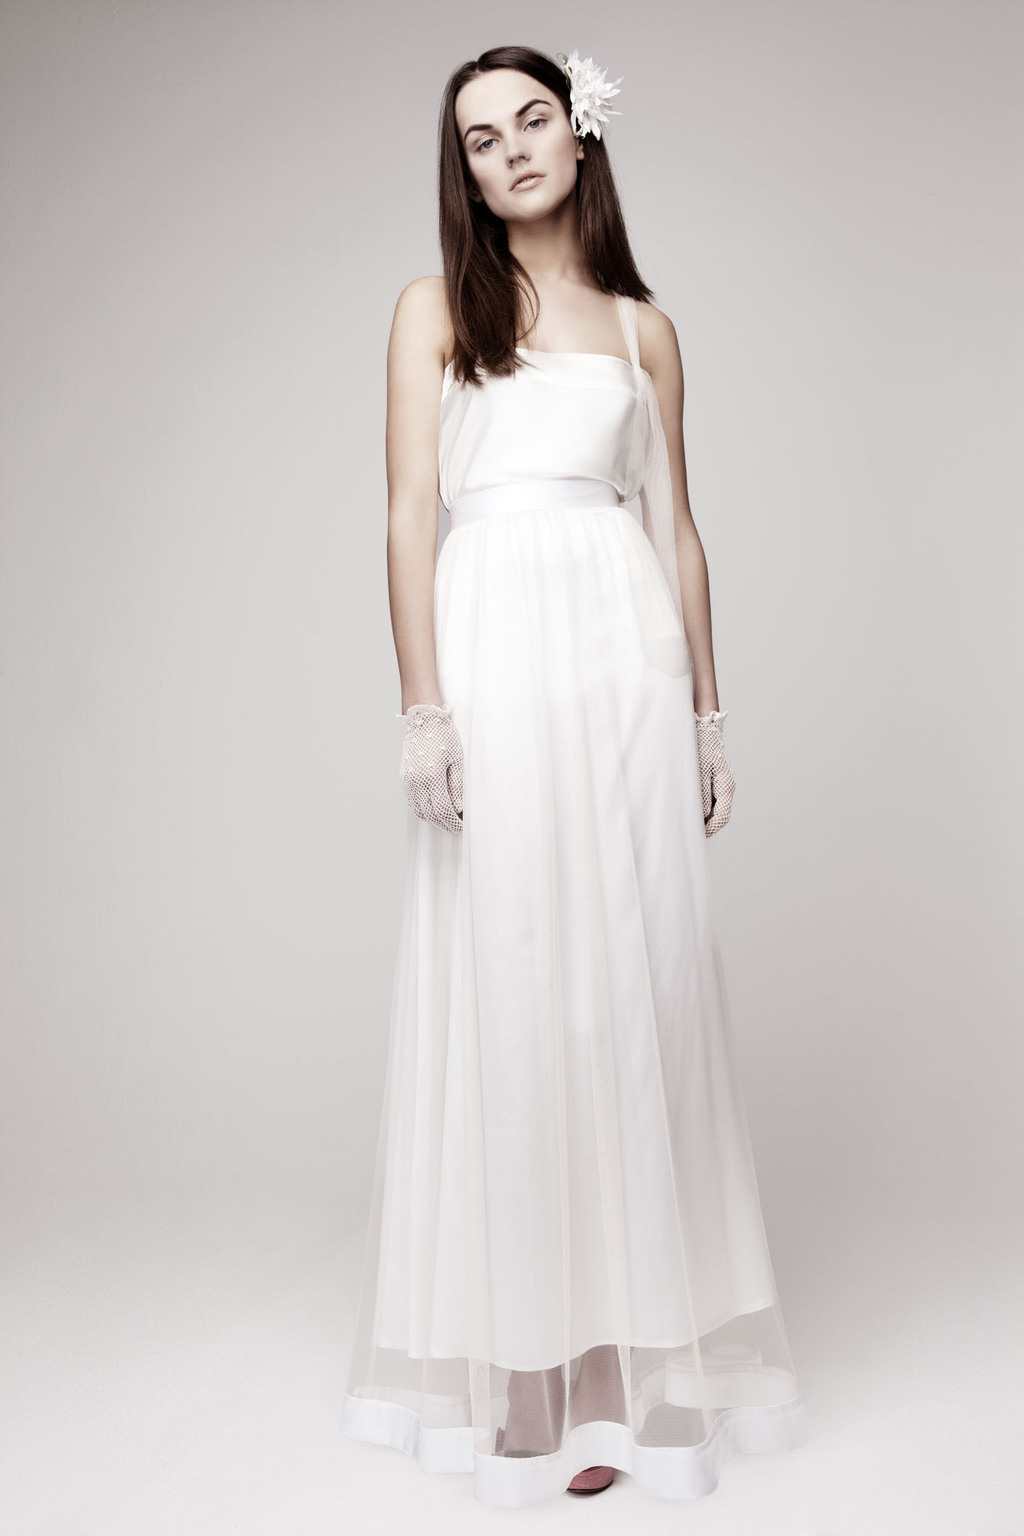 Simple-wedding-dress-for-vintage-or-modern-brides-5.full